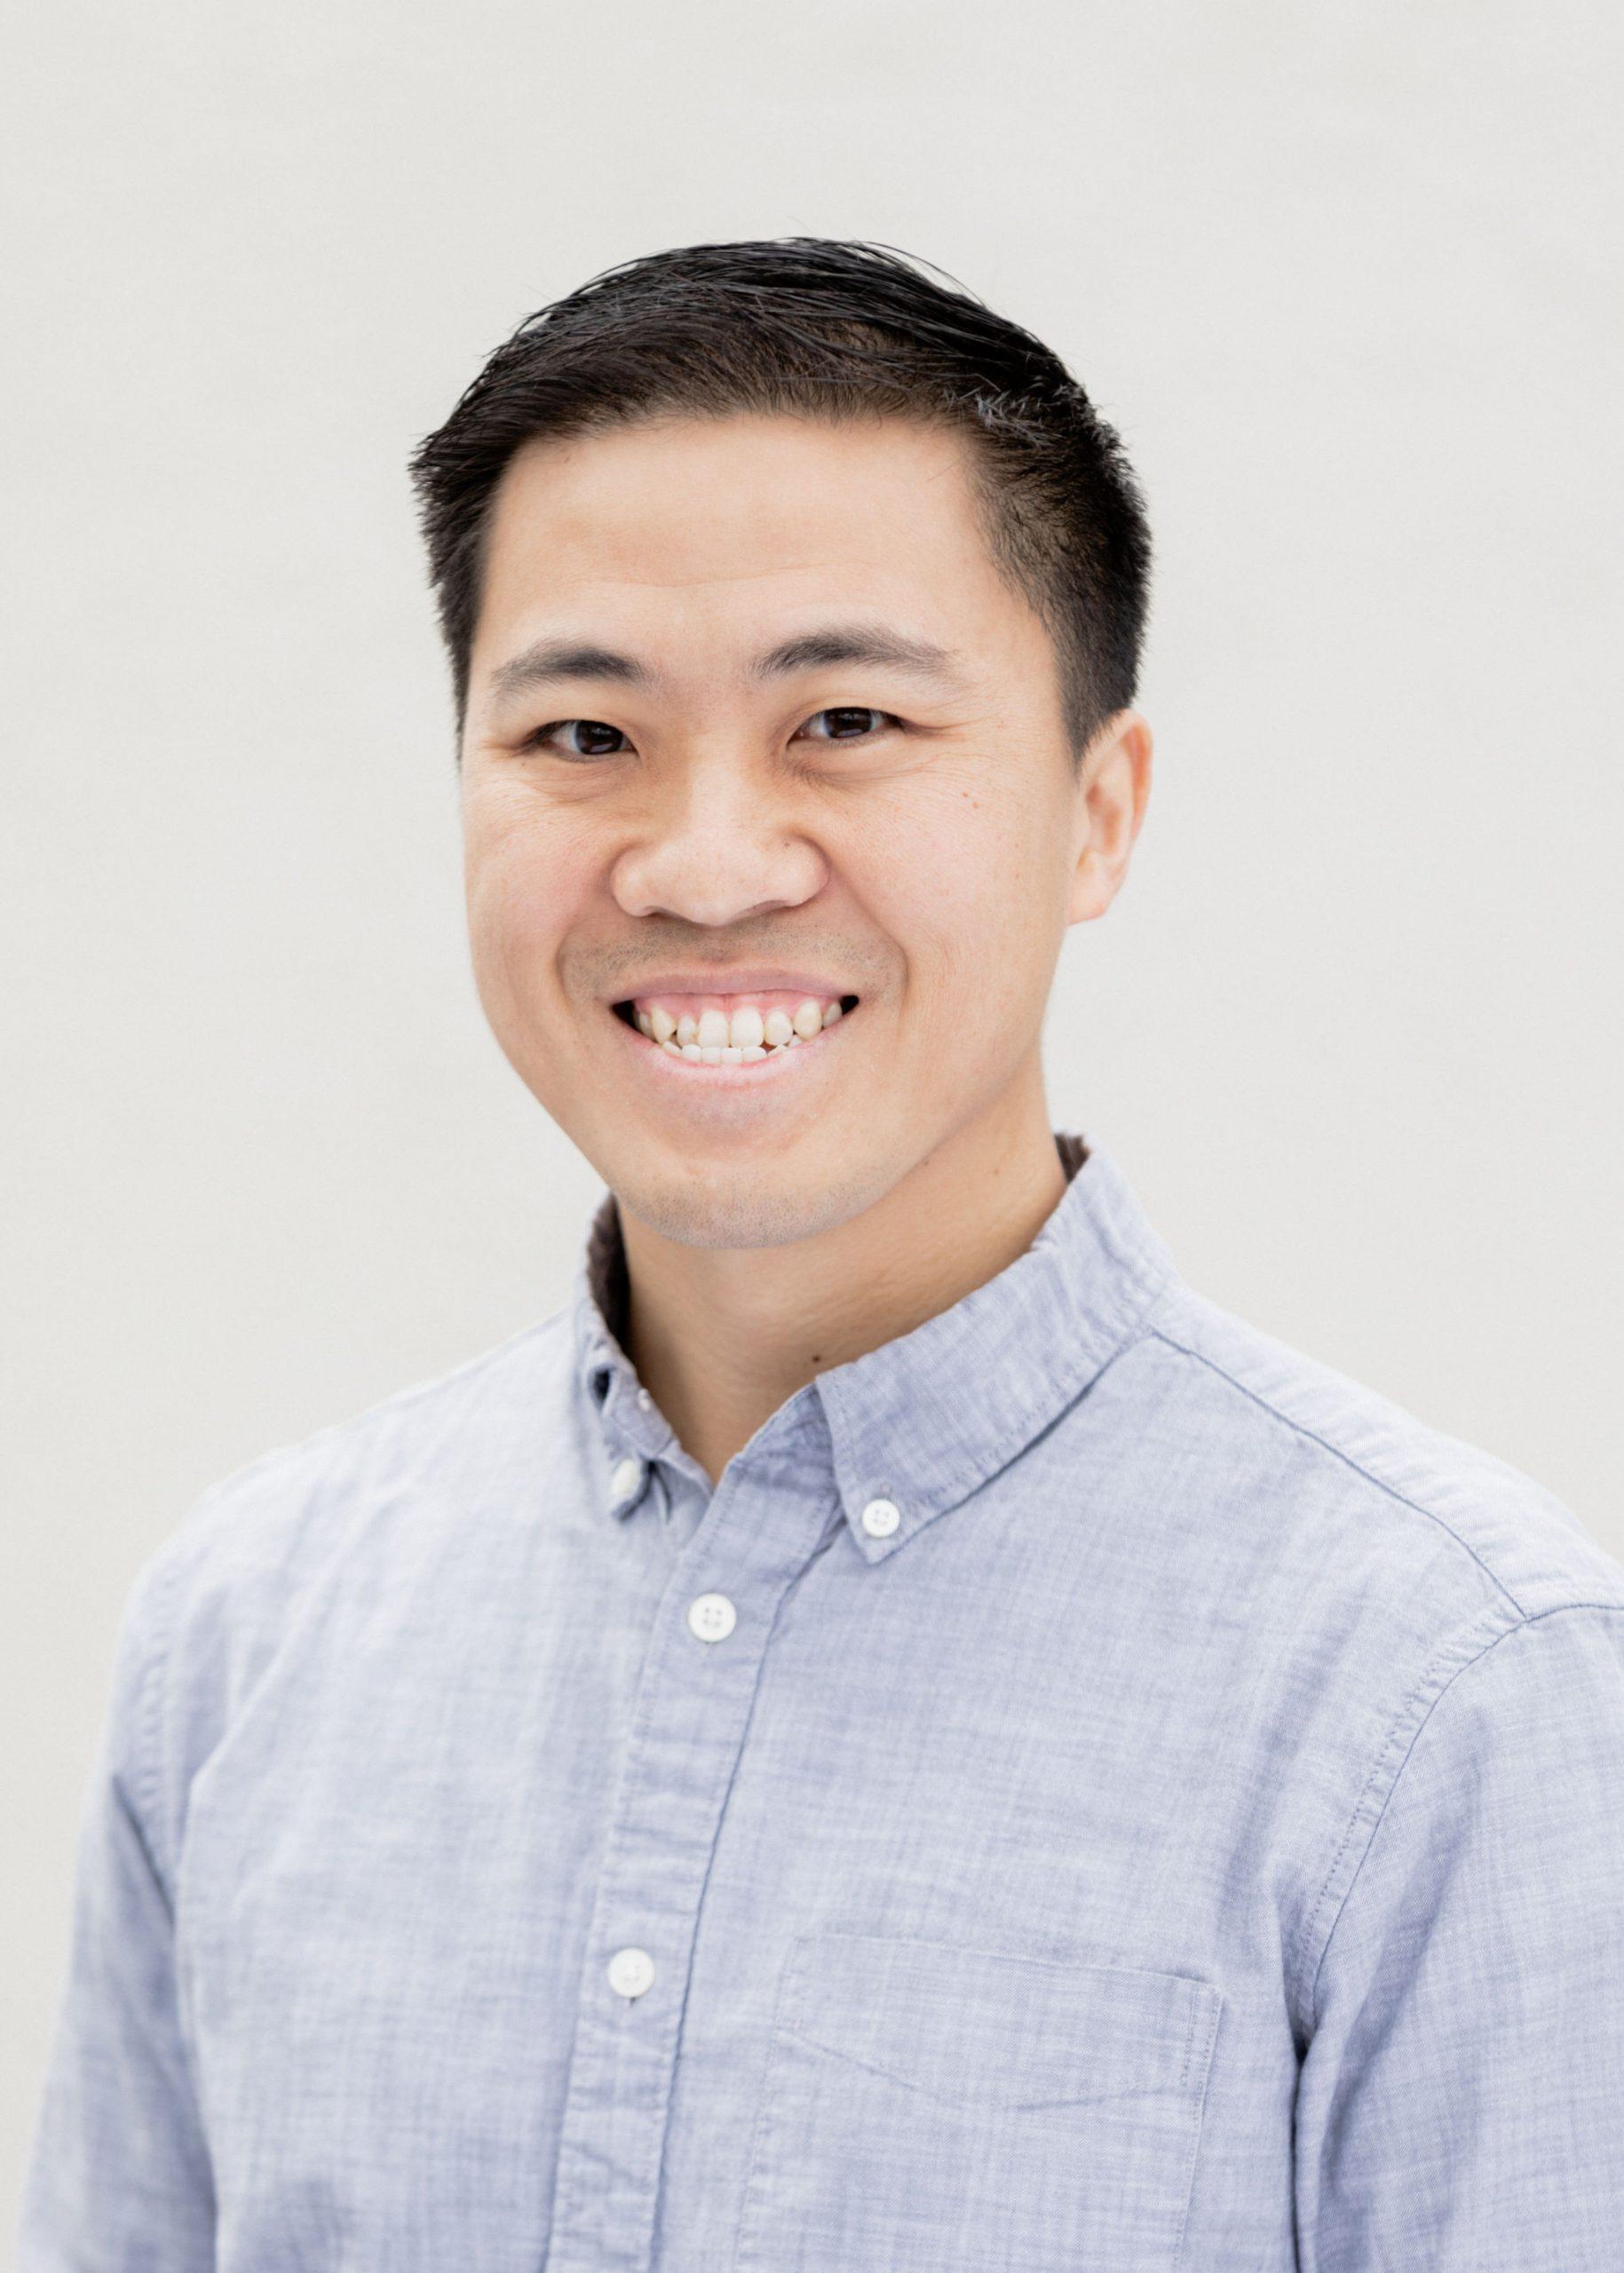 Wayne Hu